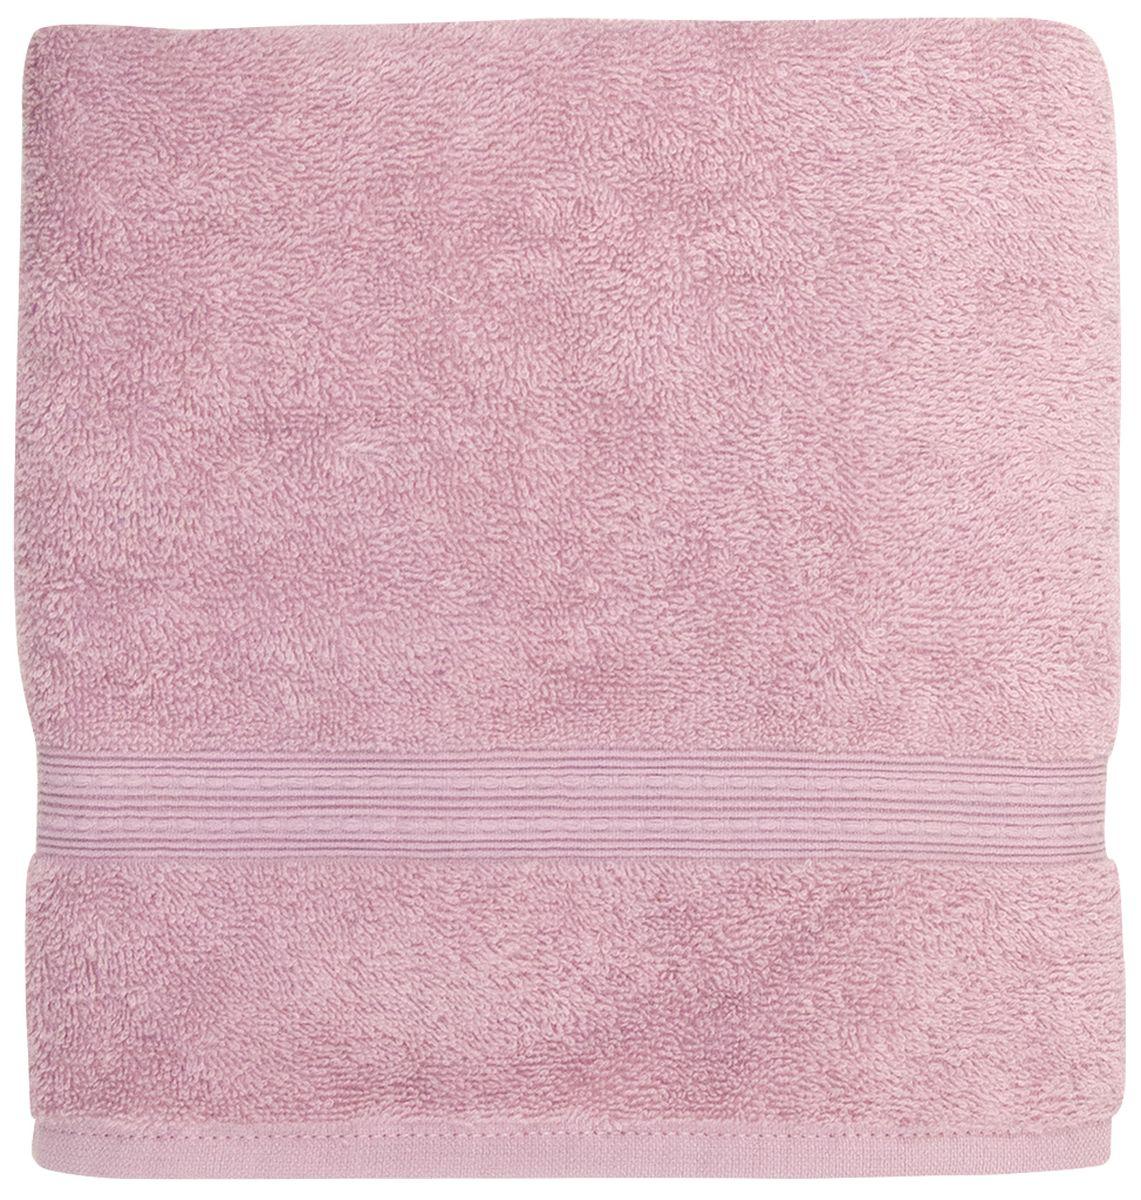 Полотенце банное Bonita Classic, махровое, цвет: лаванда, 50 x 90 см1011217217Полотенце банное 50*90 Bonita Classic, махровое